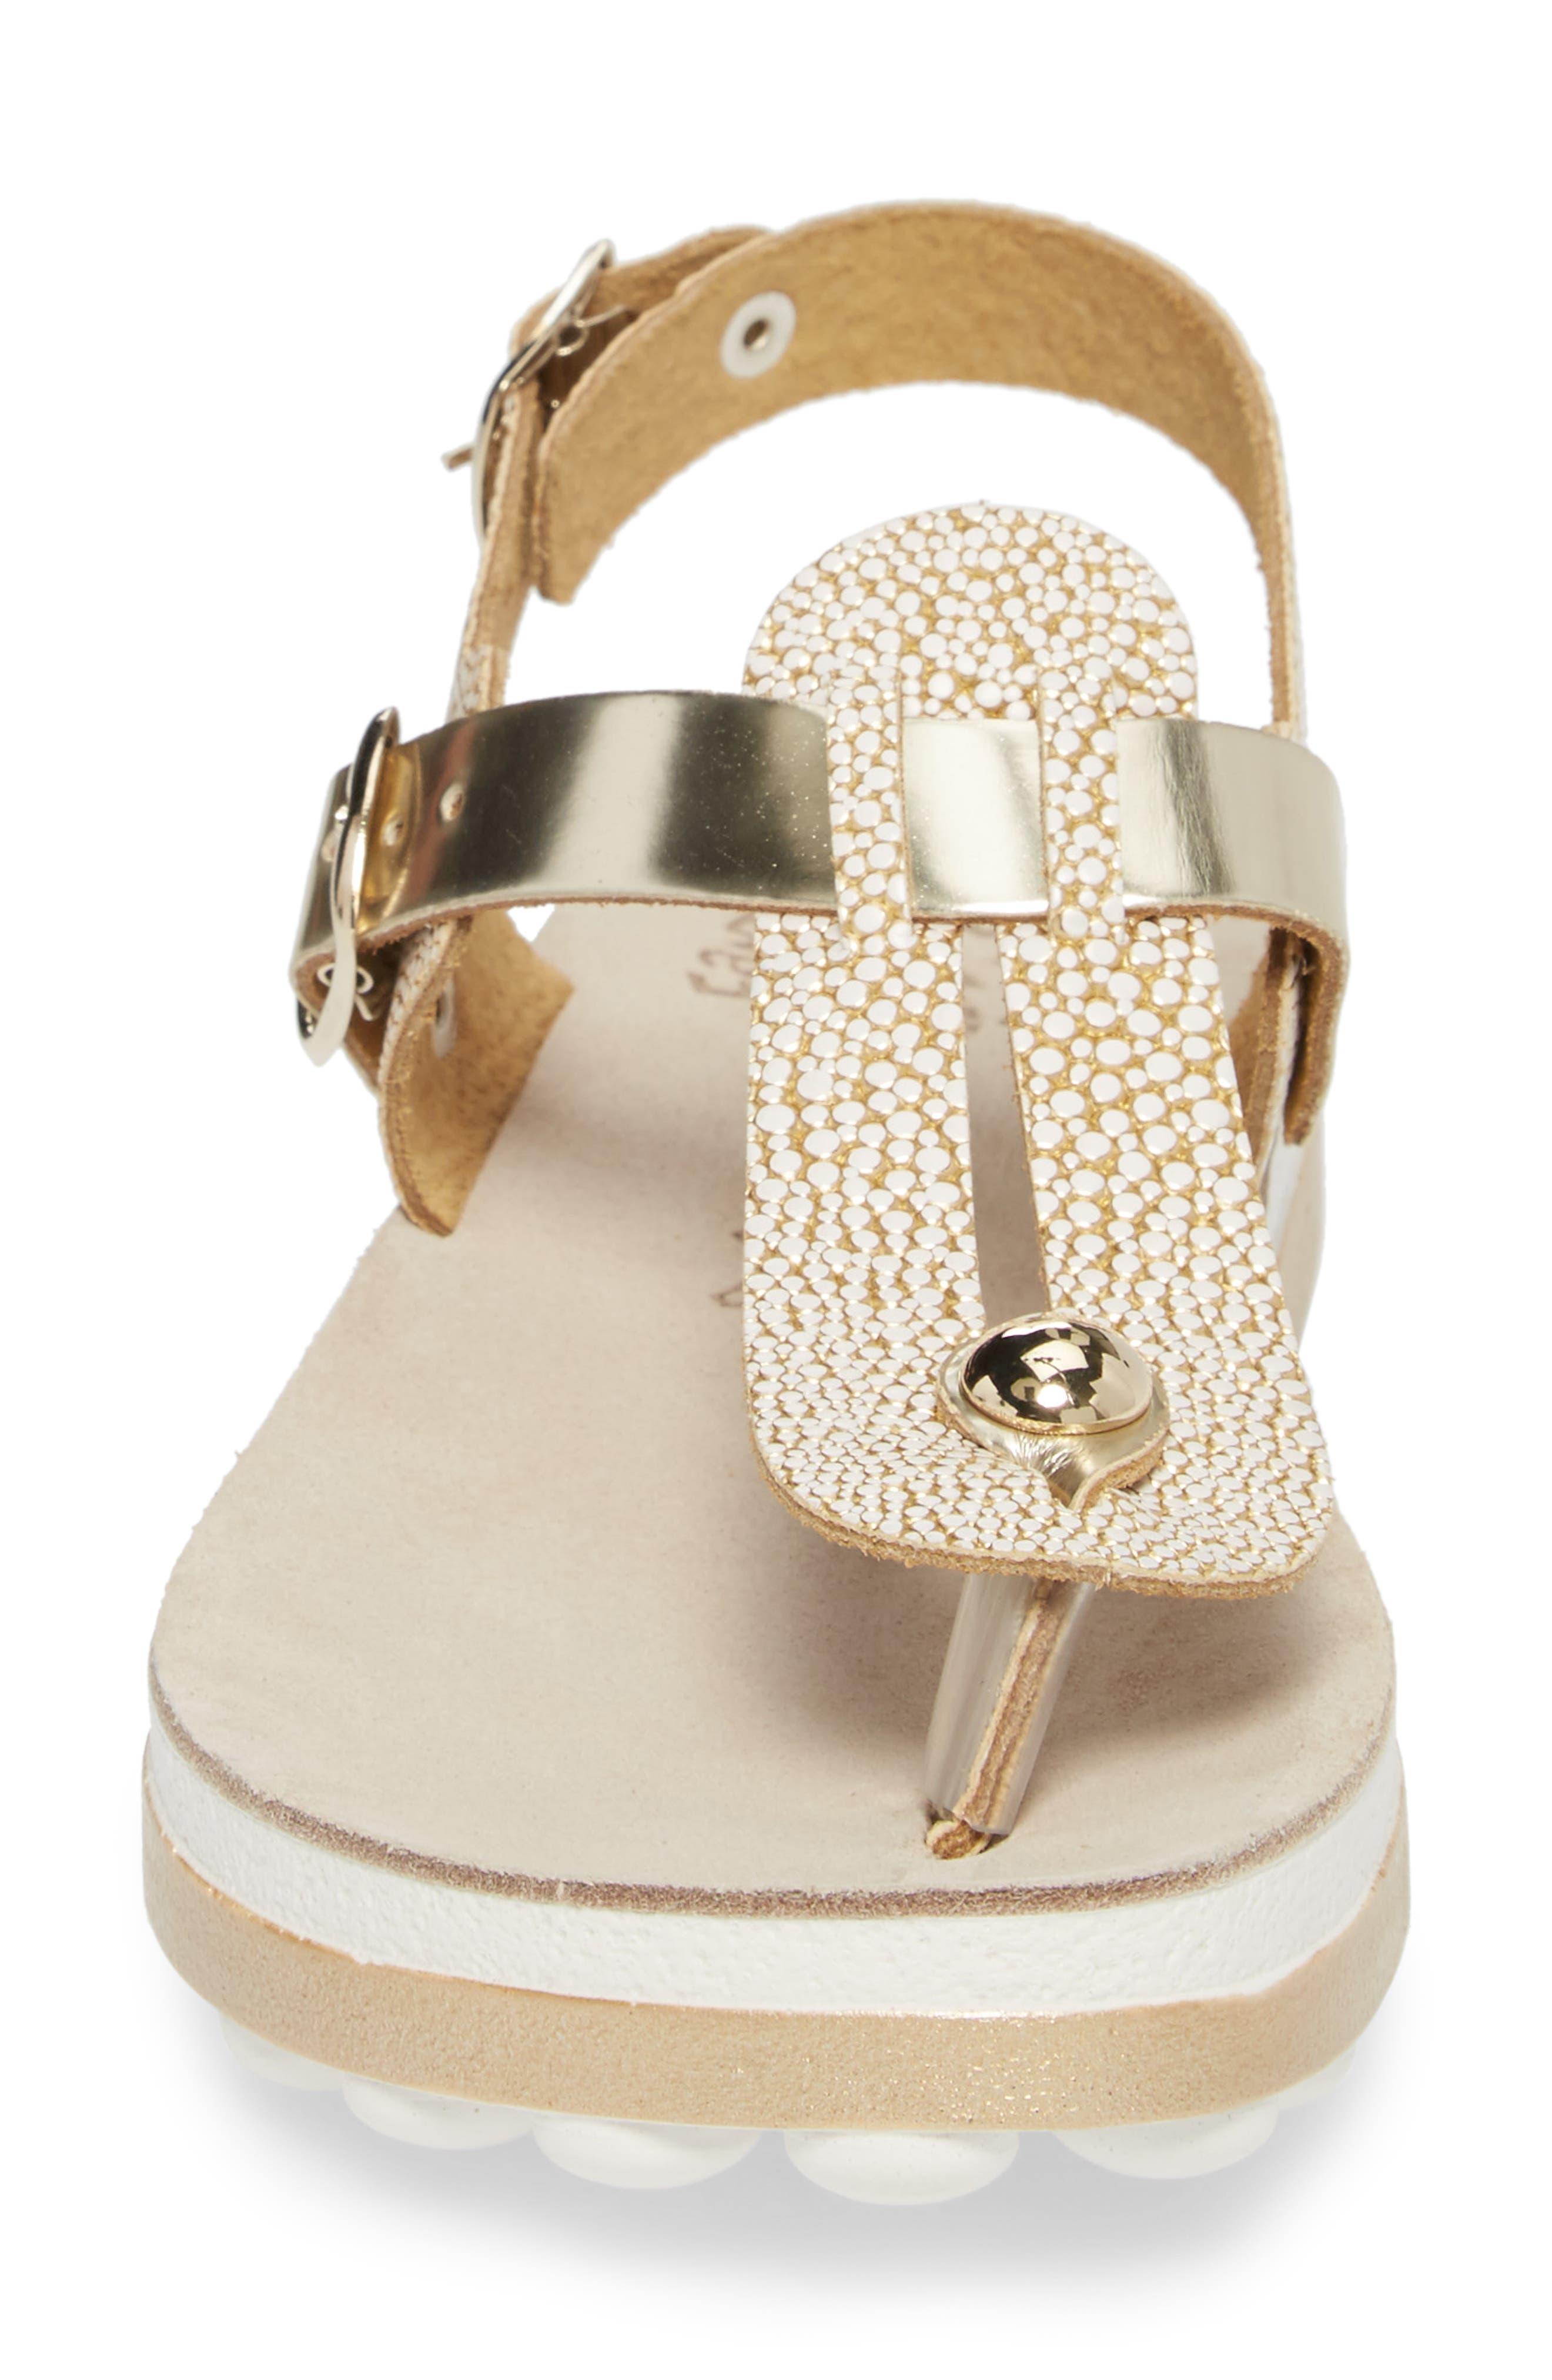 Marlena Fantasy Sandal,                             Alternate thumbnail 4, color,                             Gold Caviar Leather